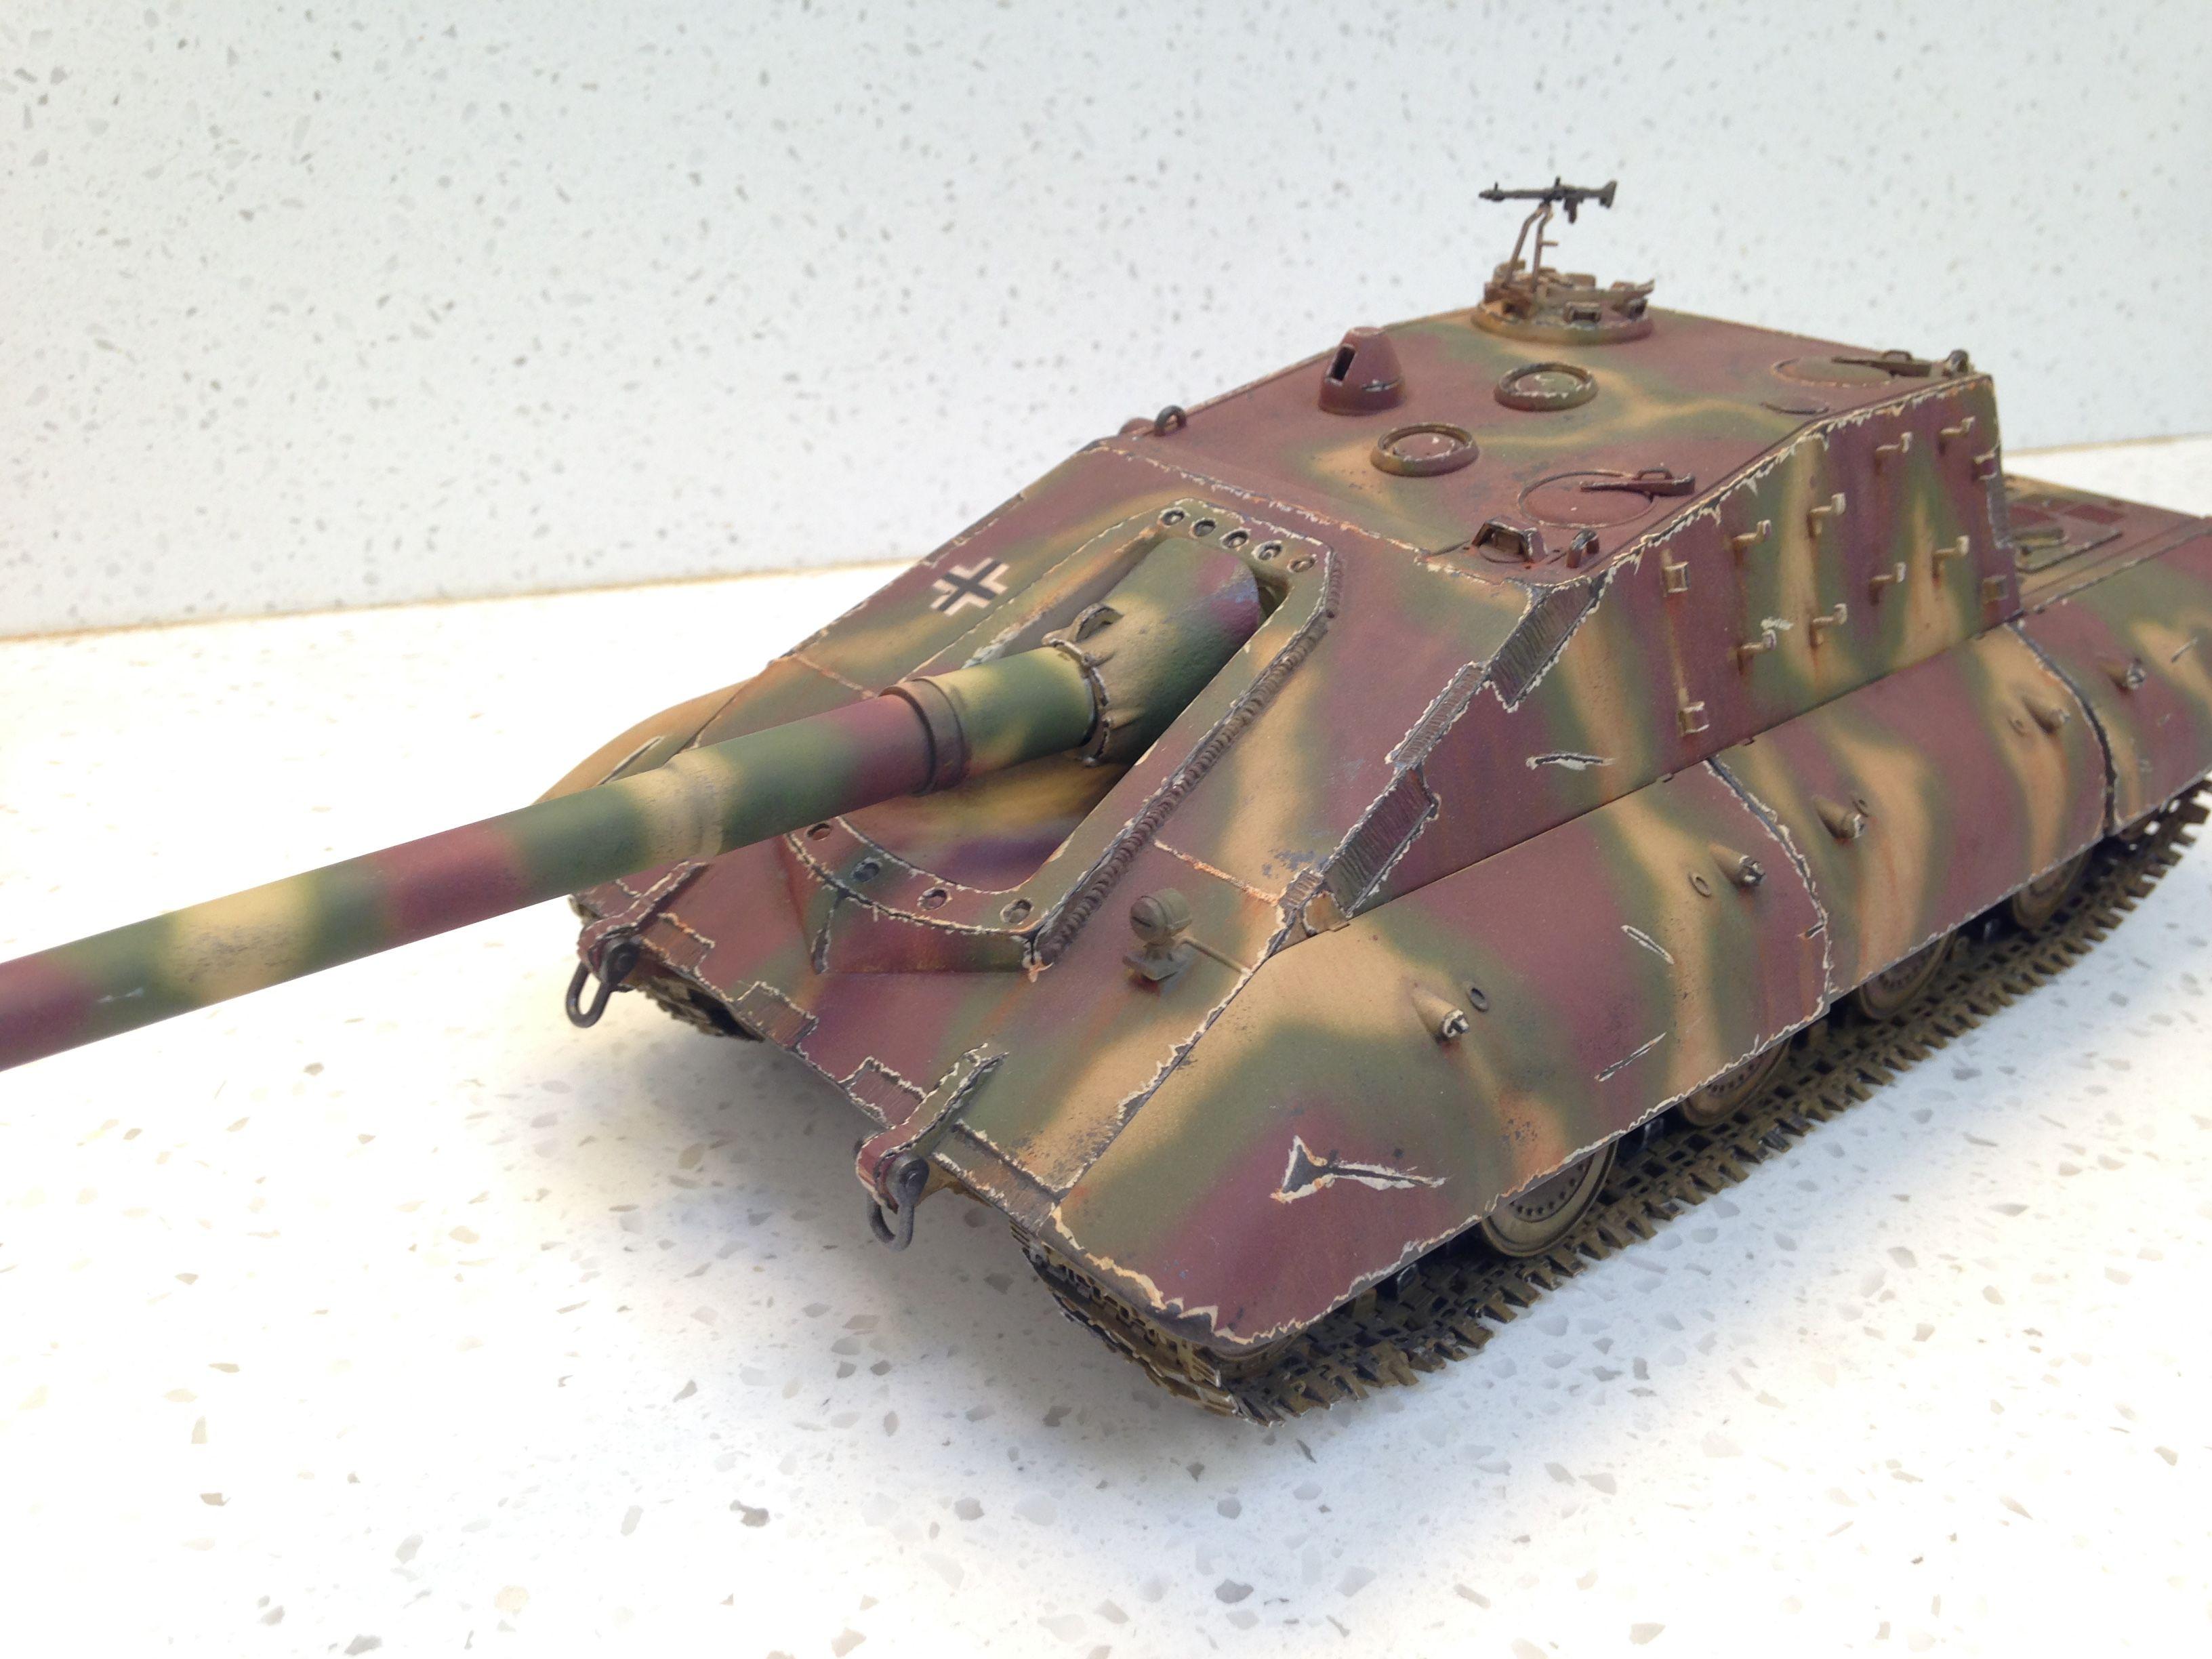 ea7da6392 For Sell now: 1/35 Jagdpanzer E100 Tier 10 Heavy Tank destroyer | WW ...